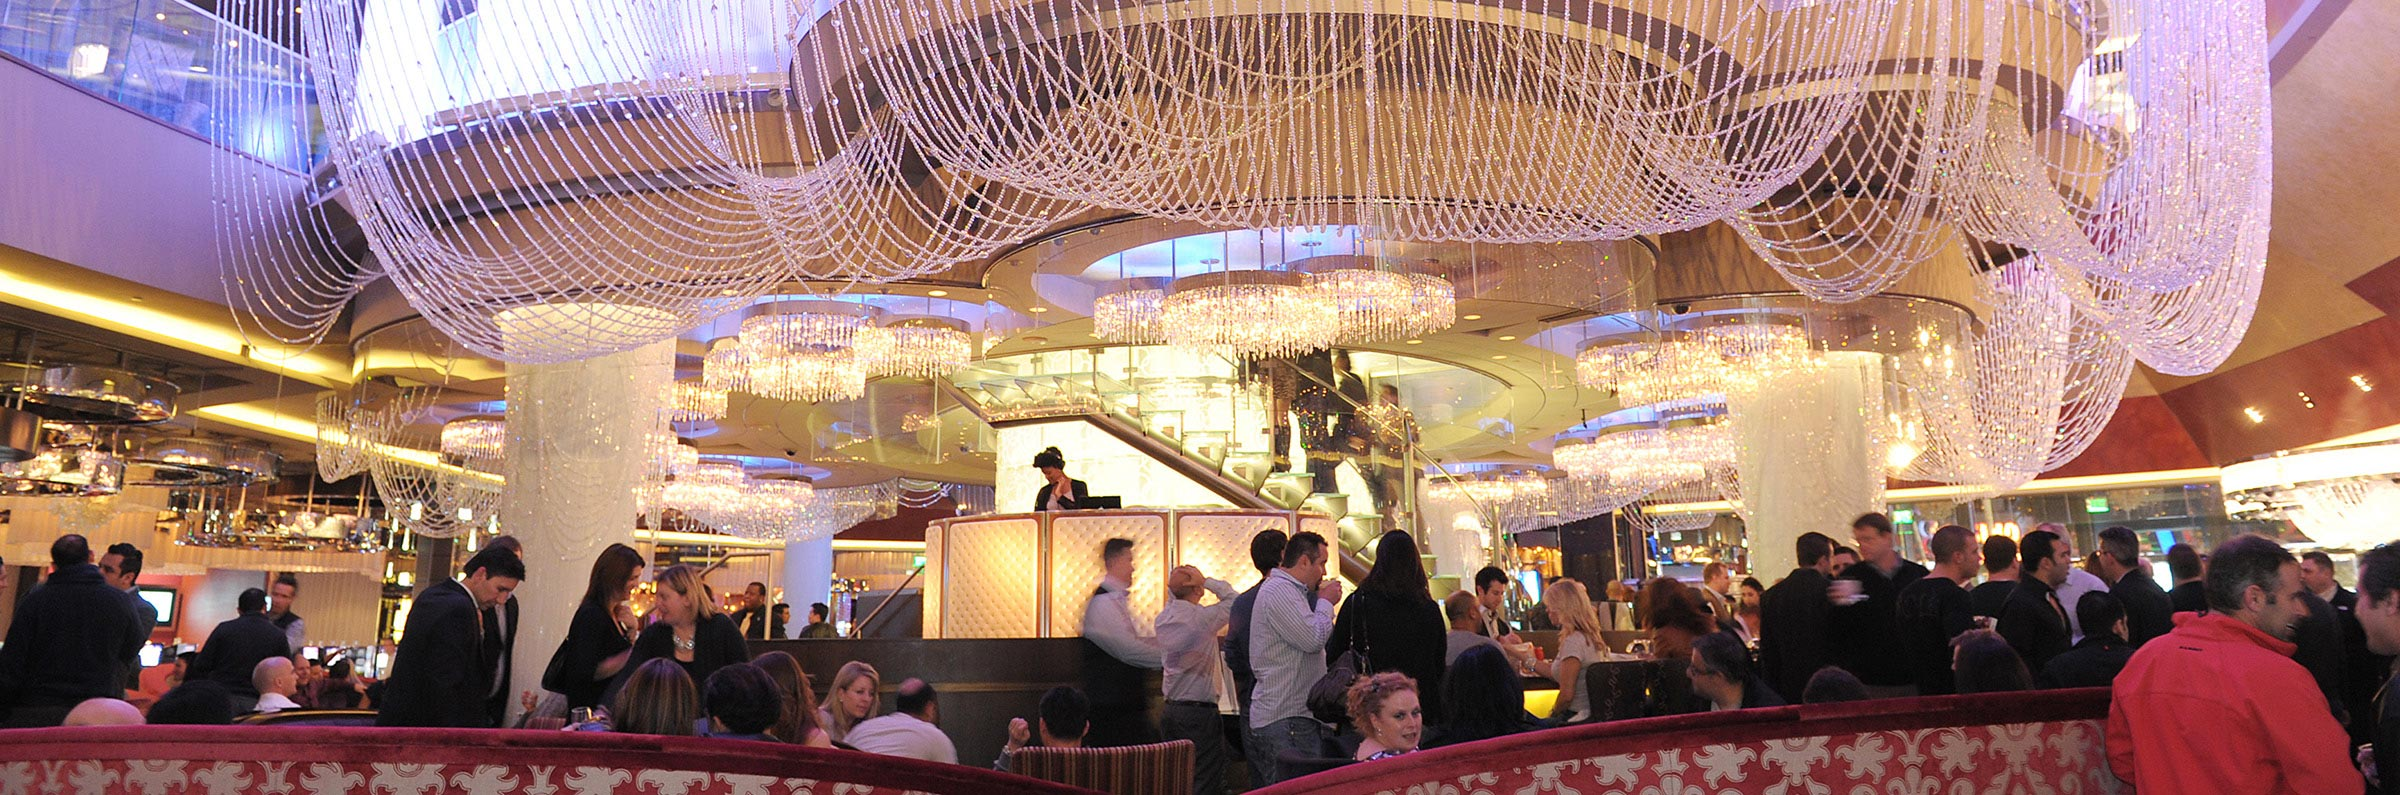 Mangiare e bere in Las Vegas